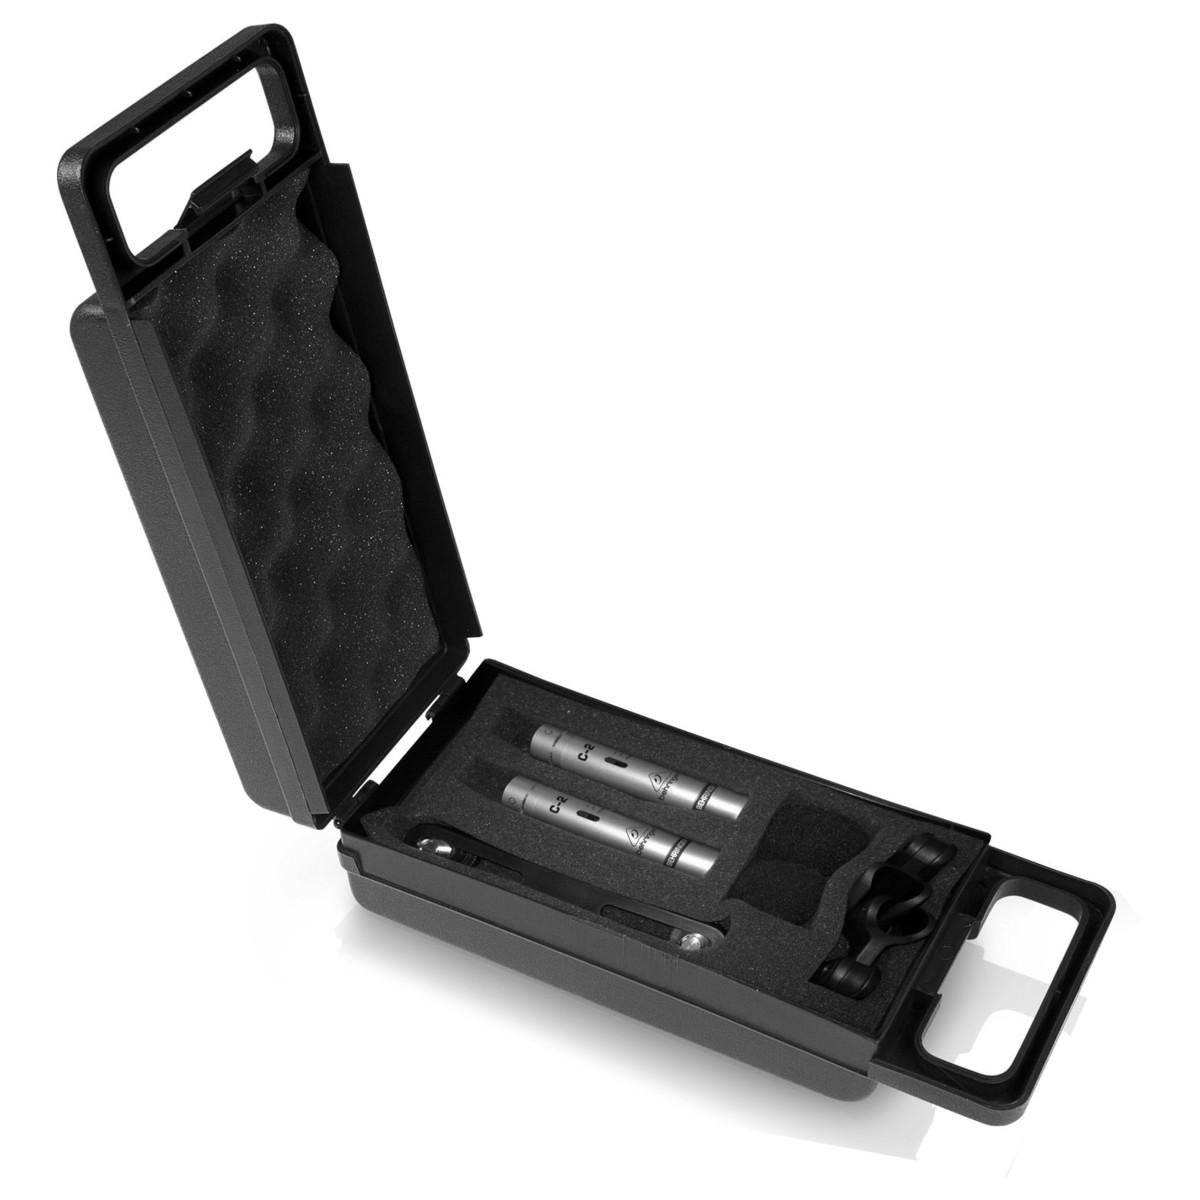 behringer c 2 condenser microphone matched pair at gear4music. Black Bedroom Furniture Sets. Home Design Ideas